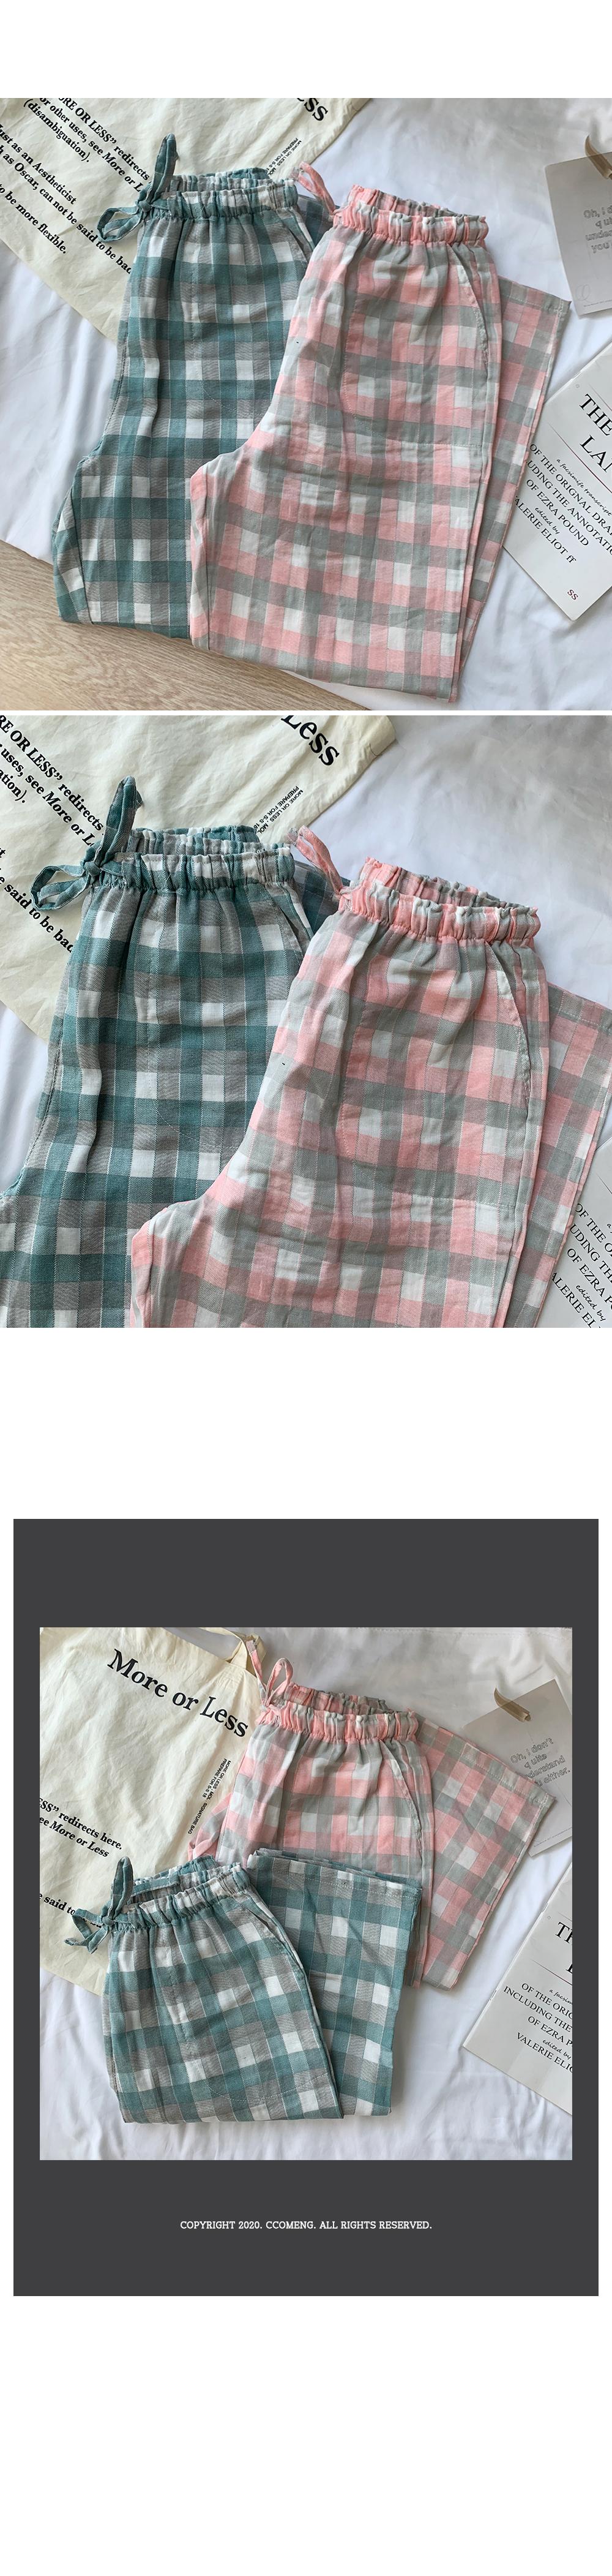 Pastel check pajama banding pants